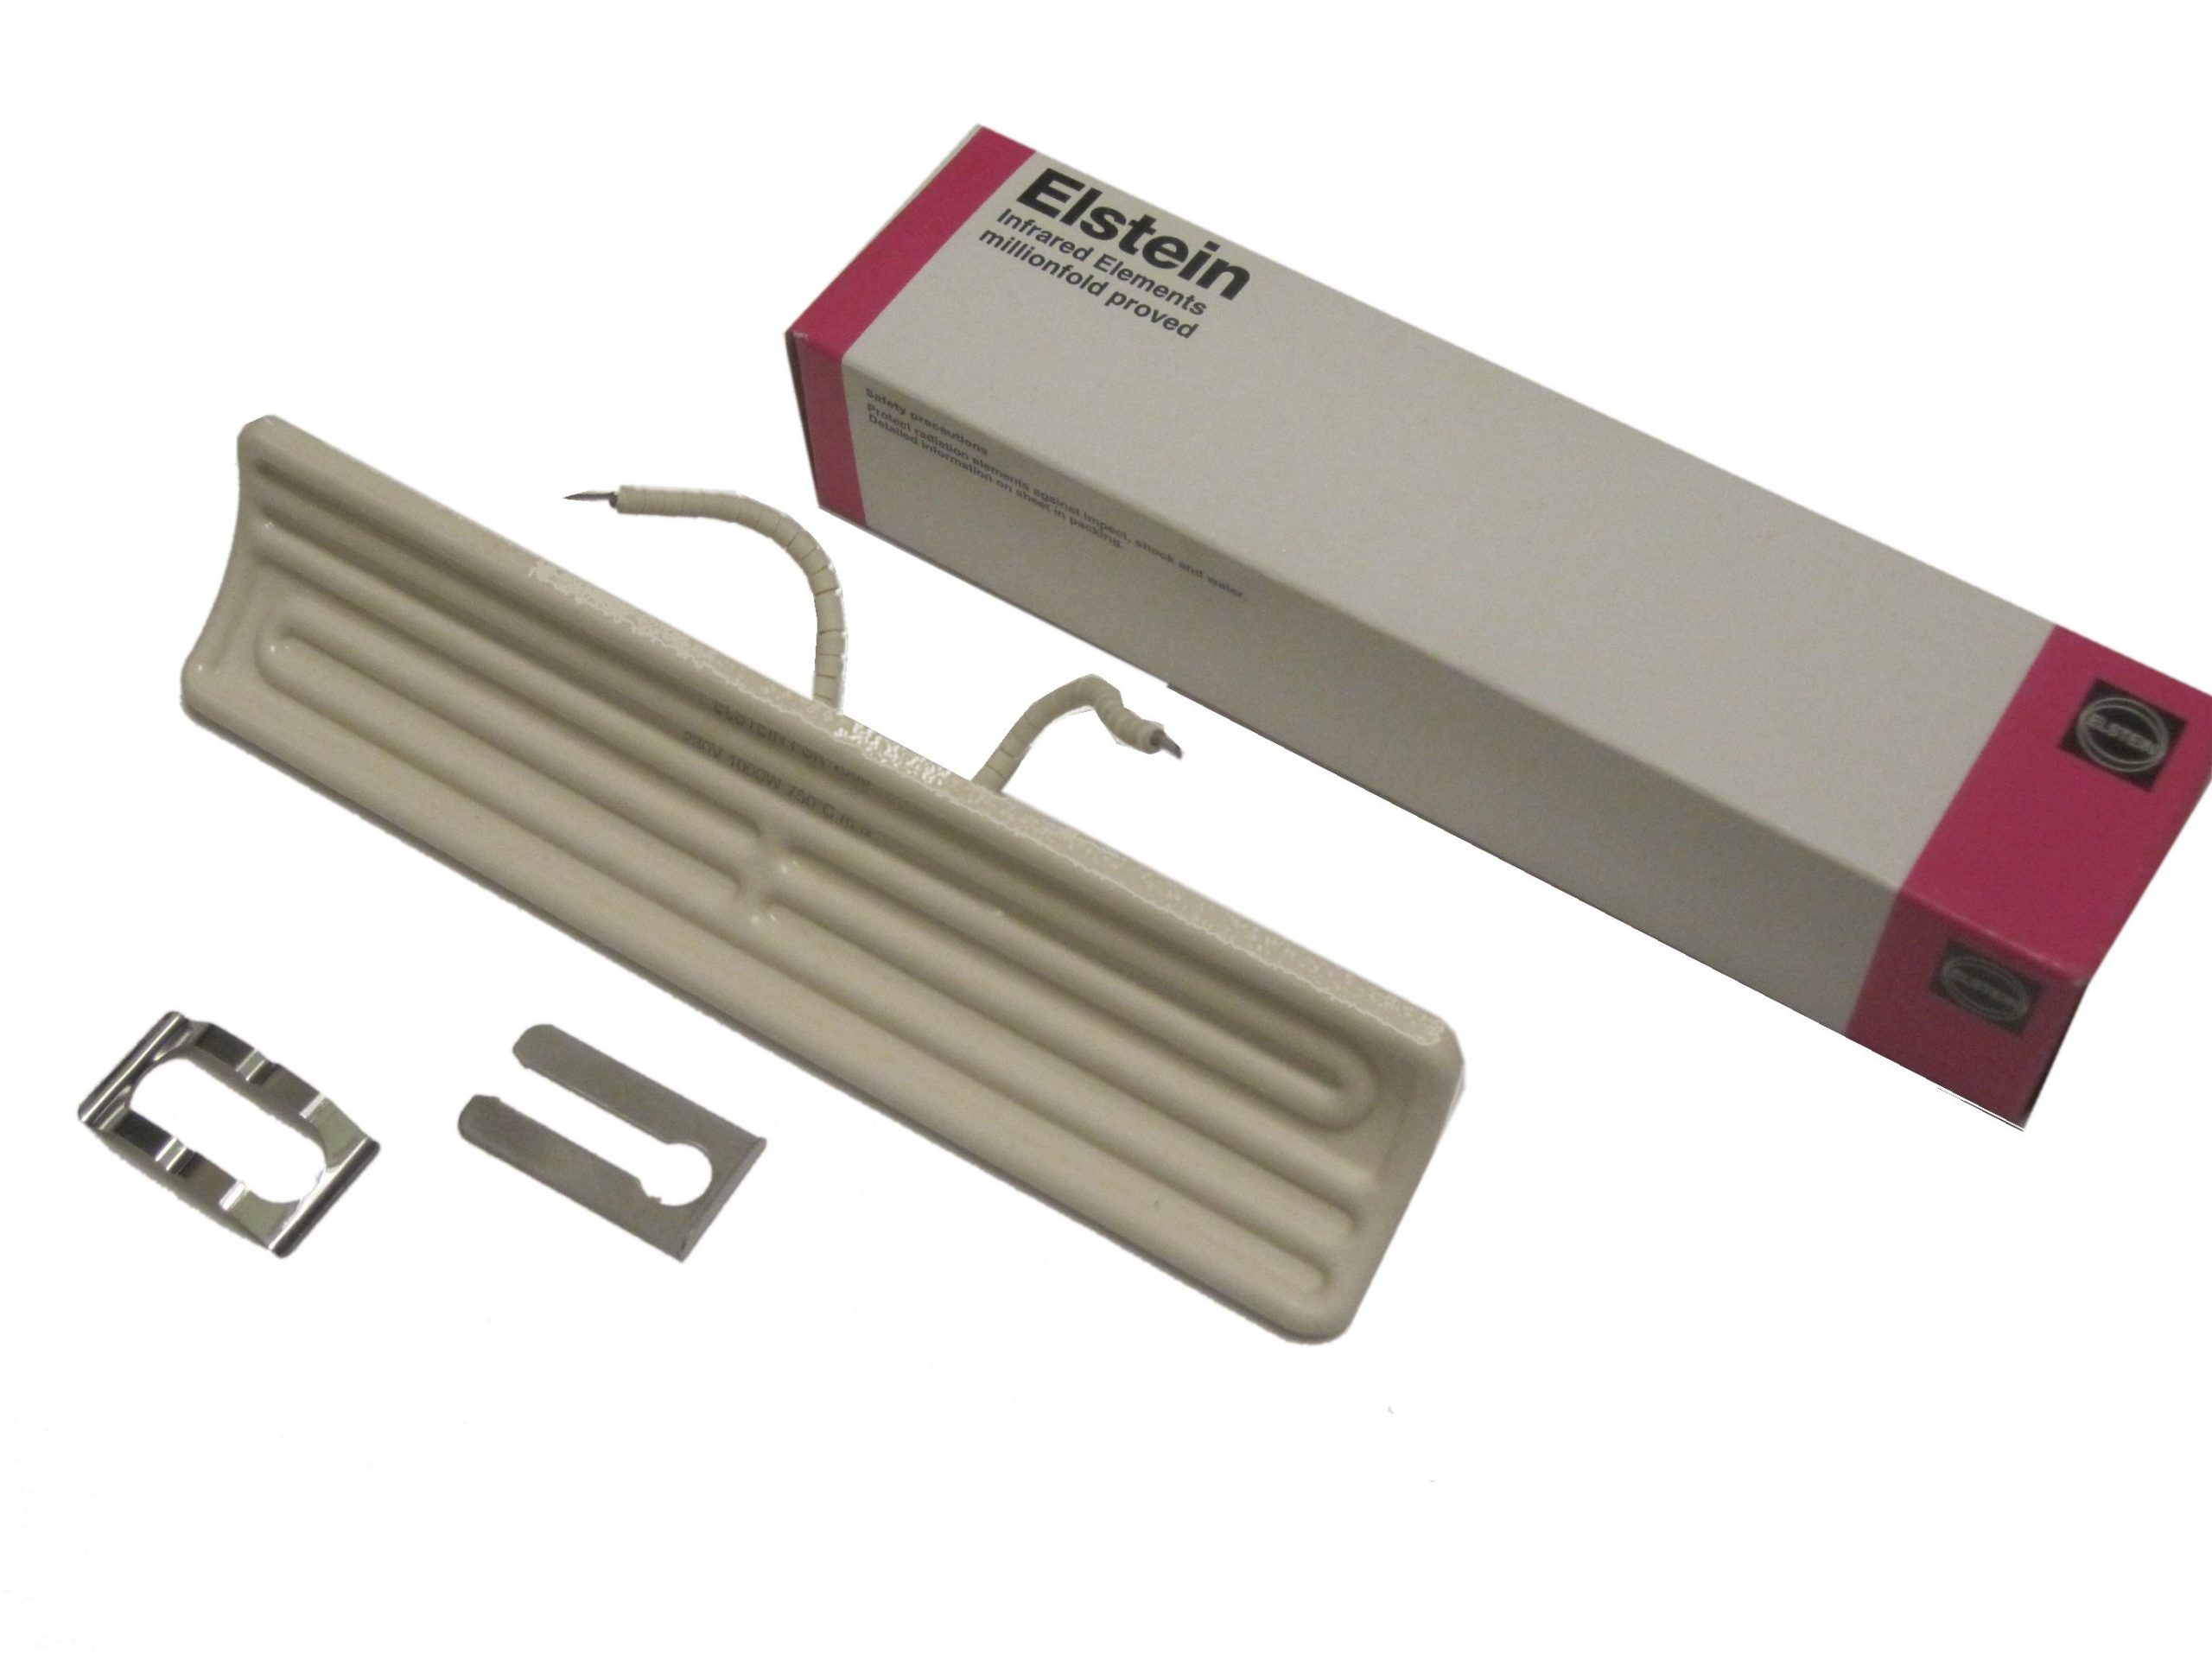 1kW Elstein Ceramic Emitter FSR1000